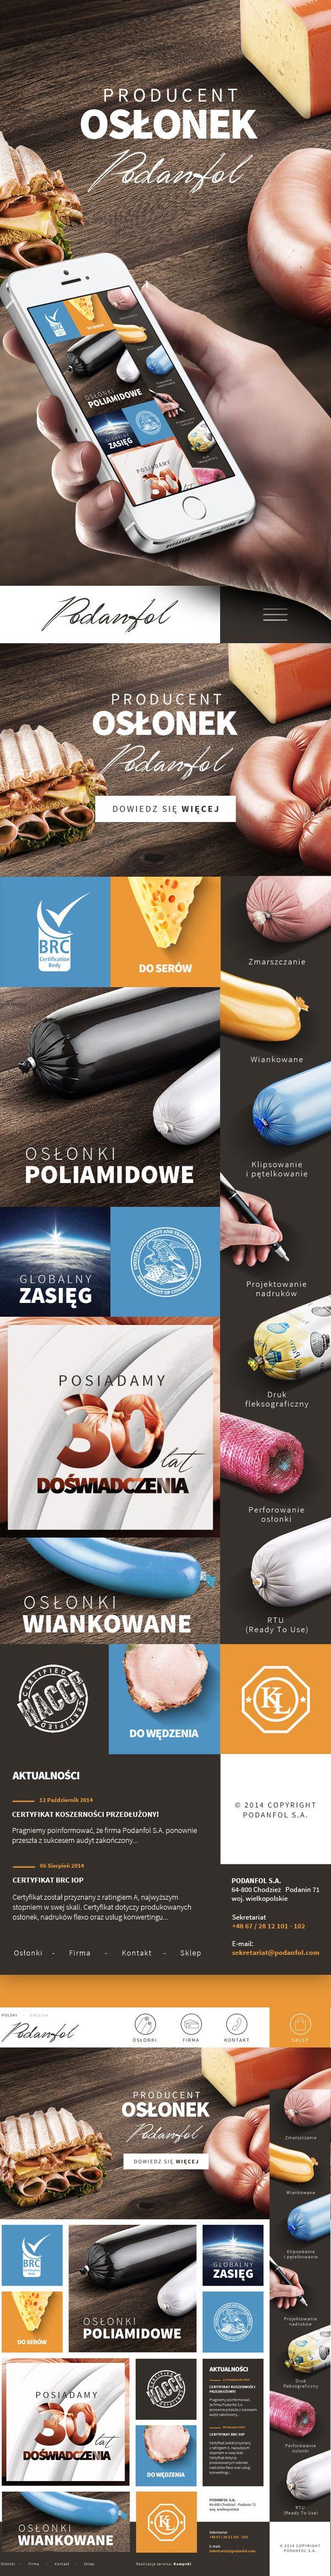 Podanfol Casings Manufacturer on Behance